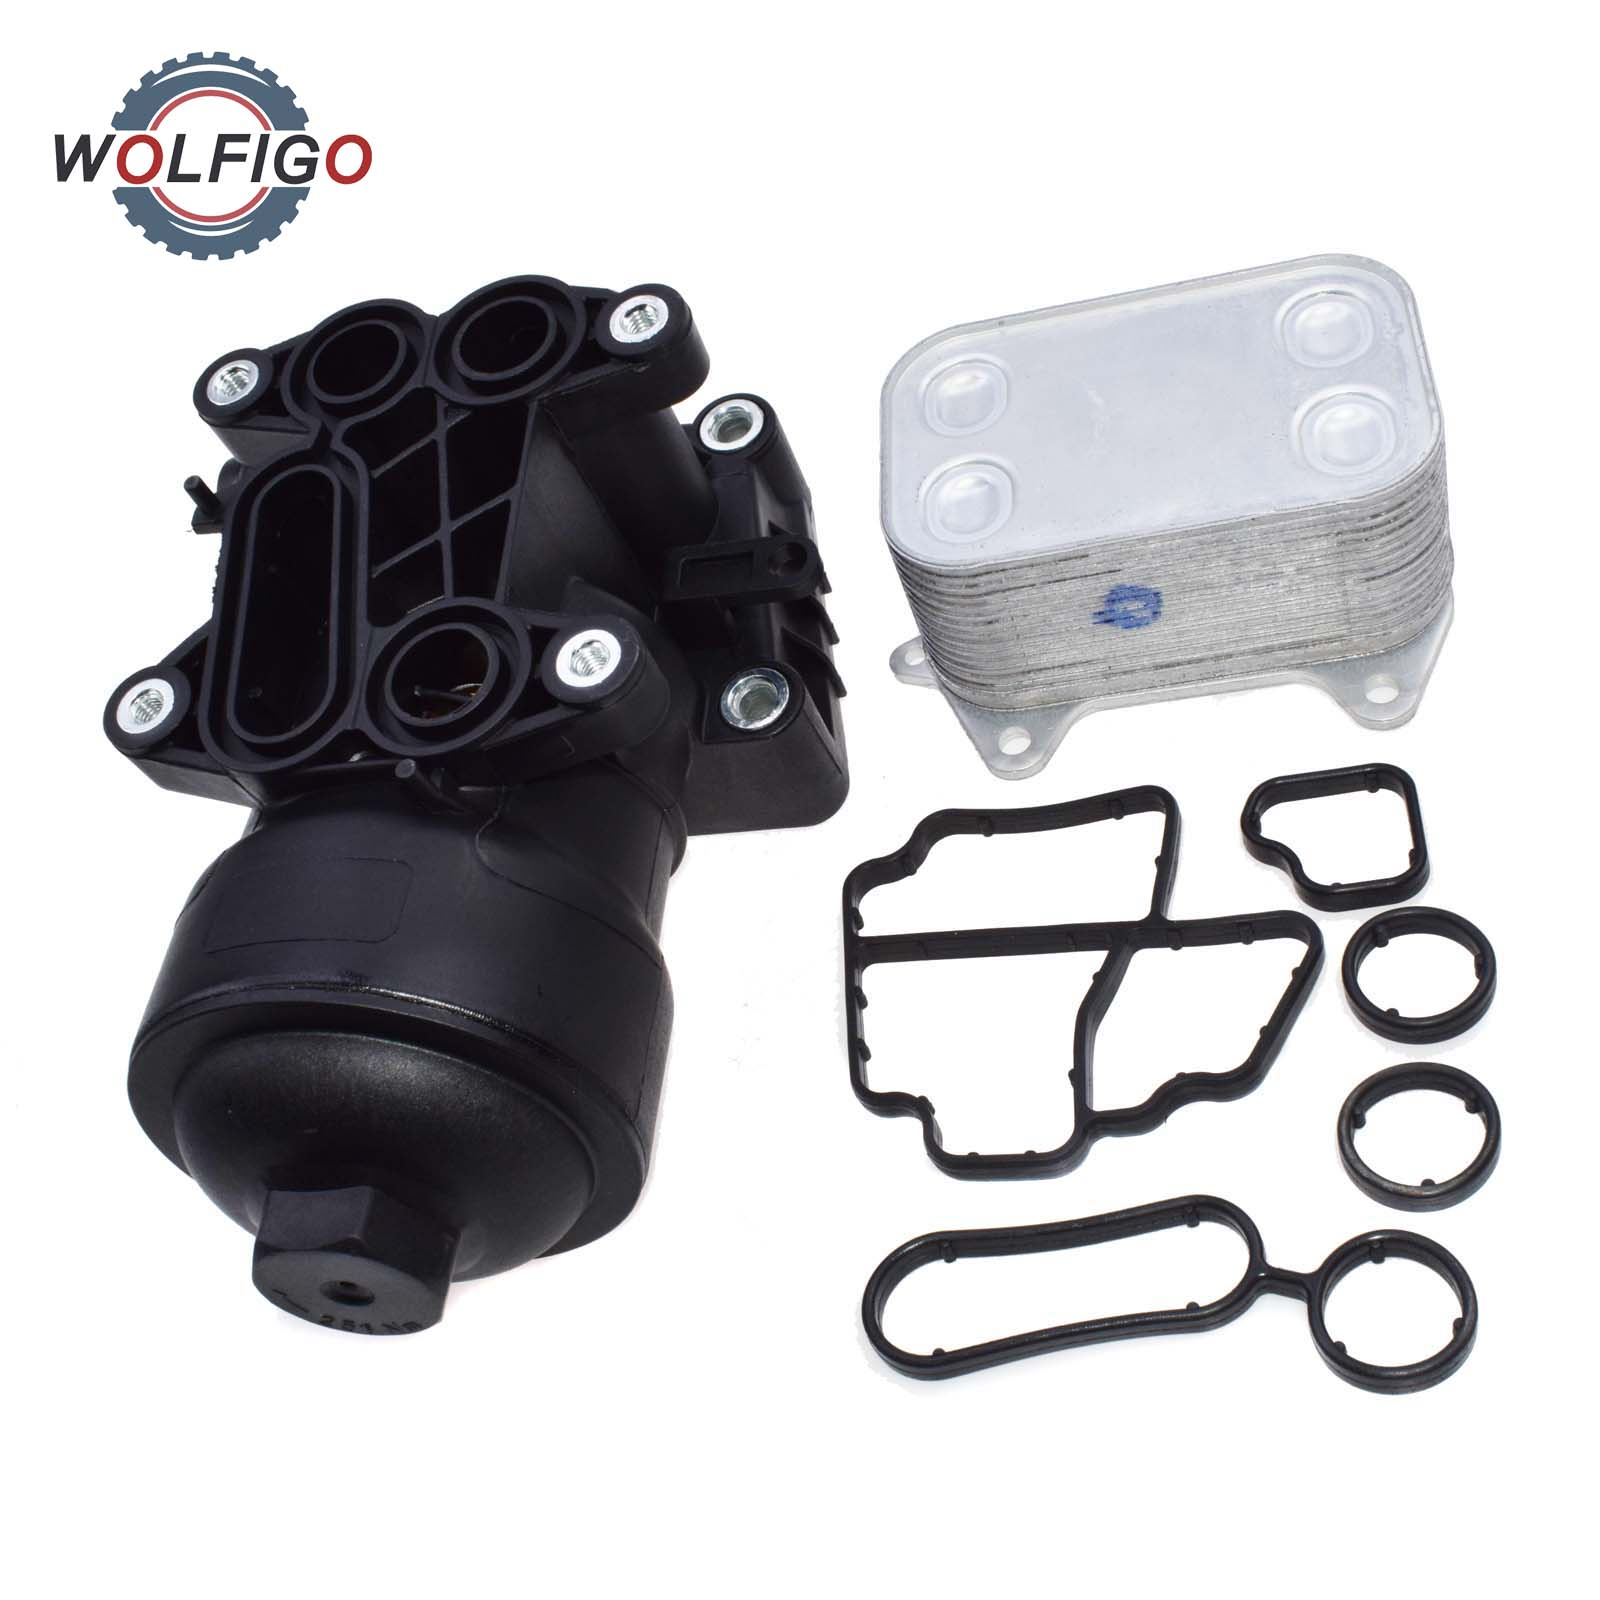 WOLFIGO nuevo 03L 115 389 B/C/G/H de filtro de aceite de la Asamblea para AUDI A3 A4 VW asiento SKODA 1,6 2,0 TDI VW 03L 115 B 389 VW 03L 115, 389 C